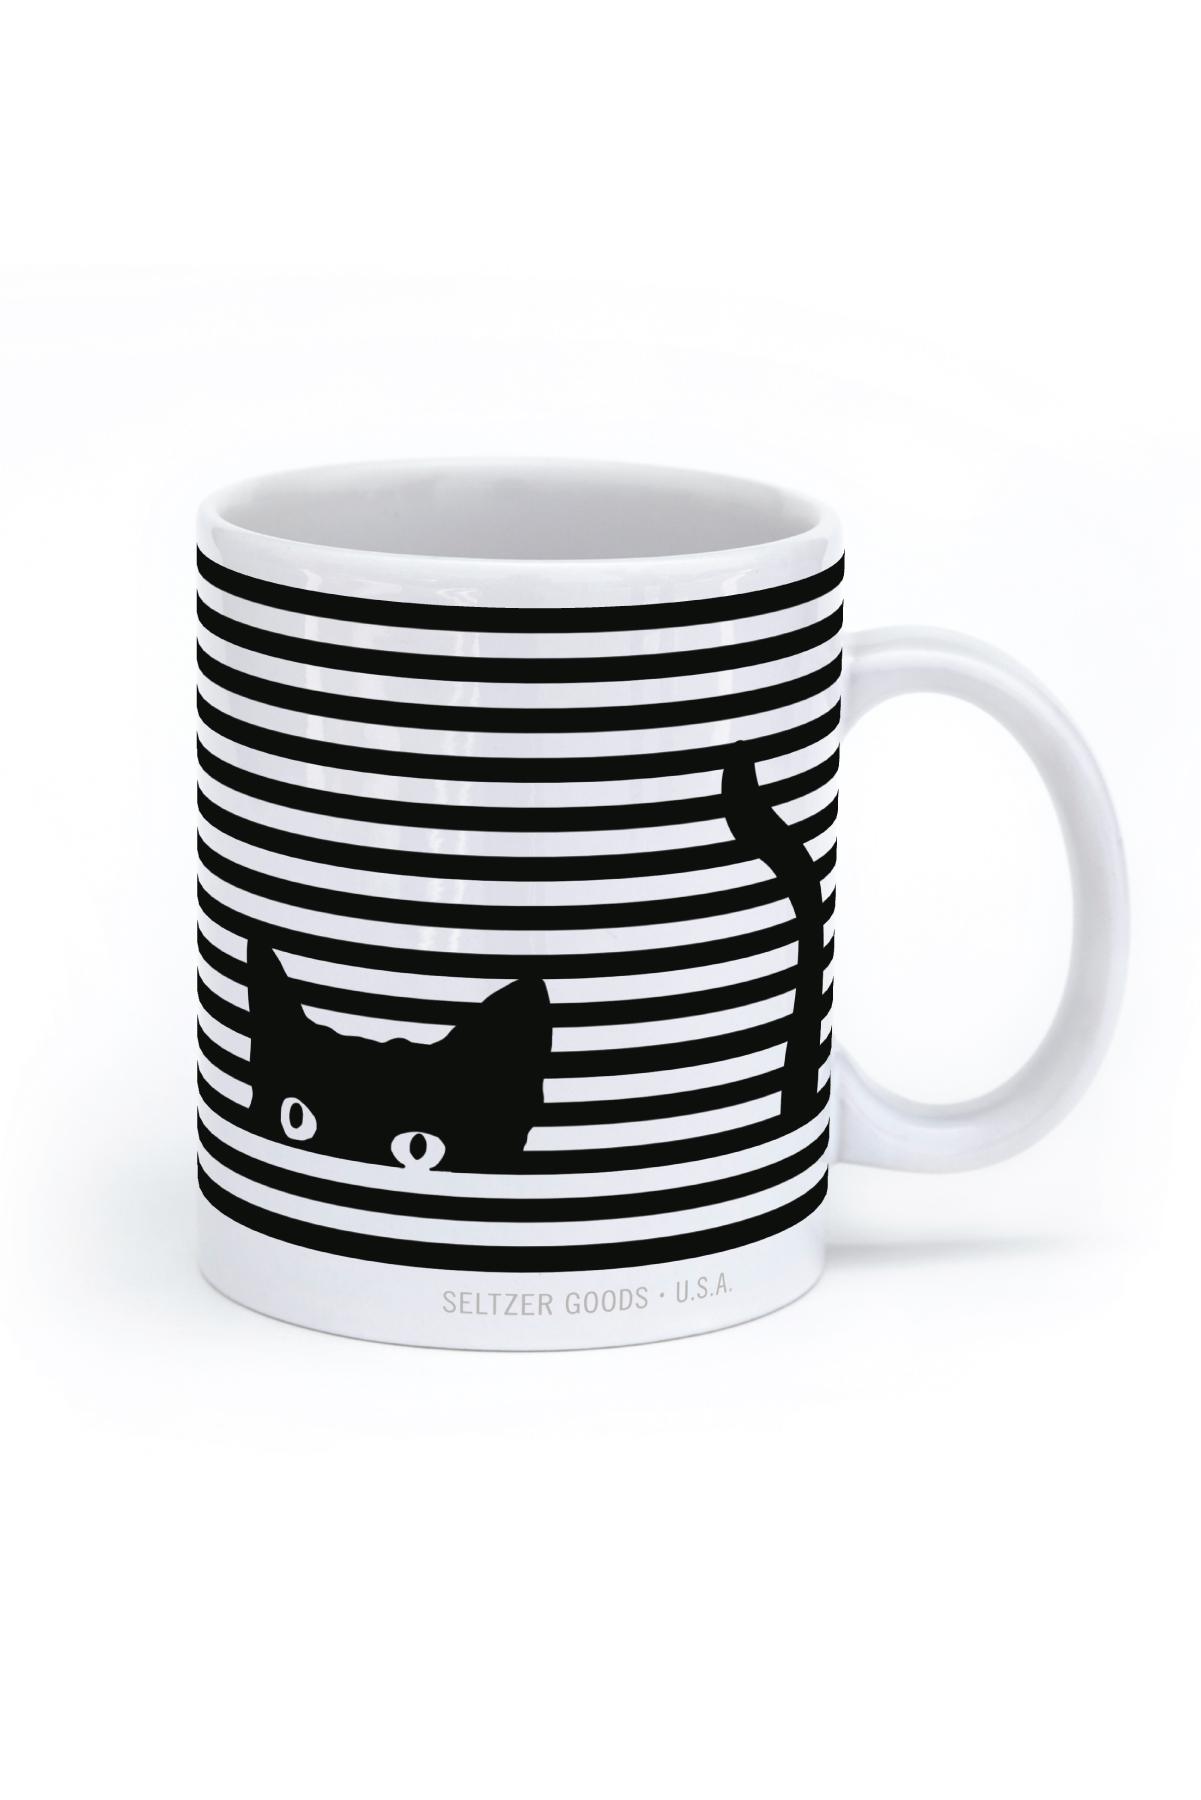 Seltzer goods cat stripes. Mug clipart striped